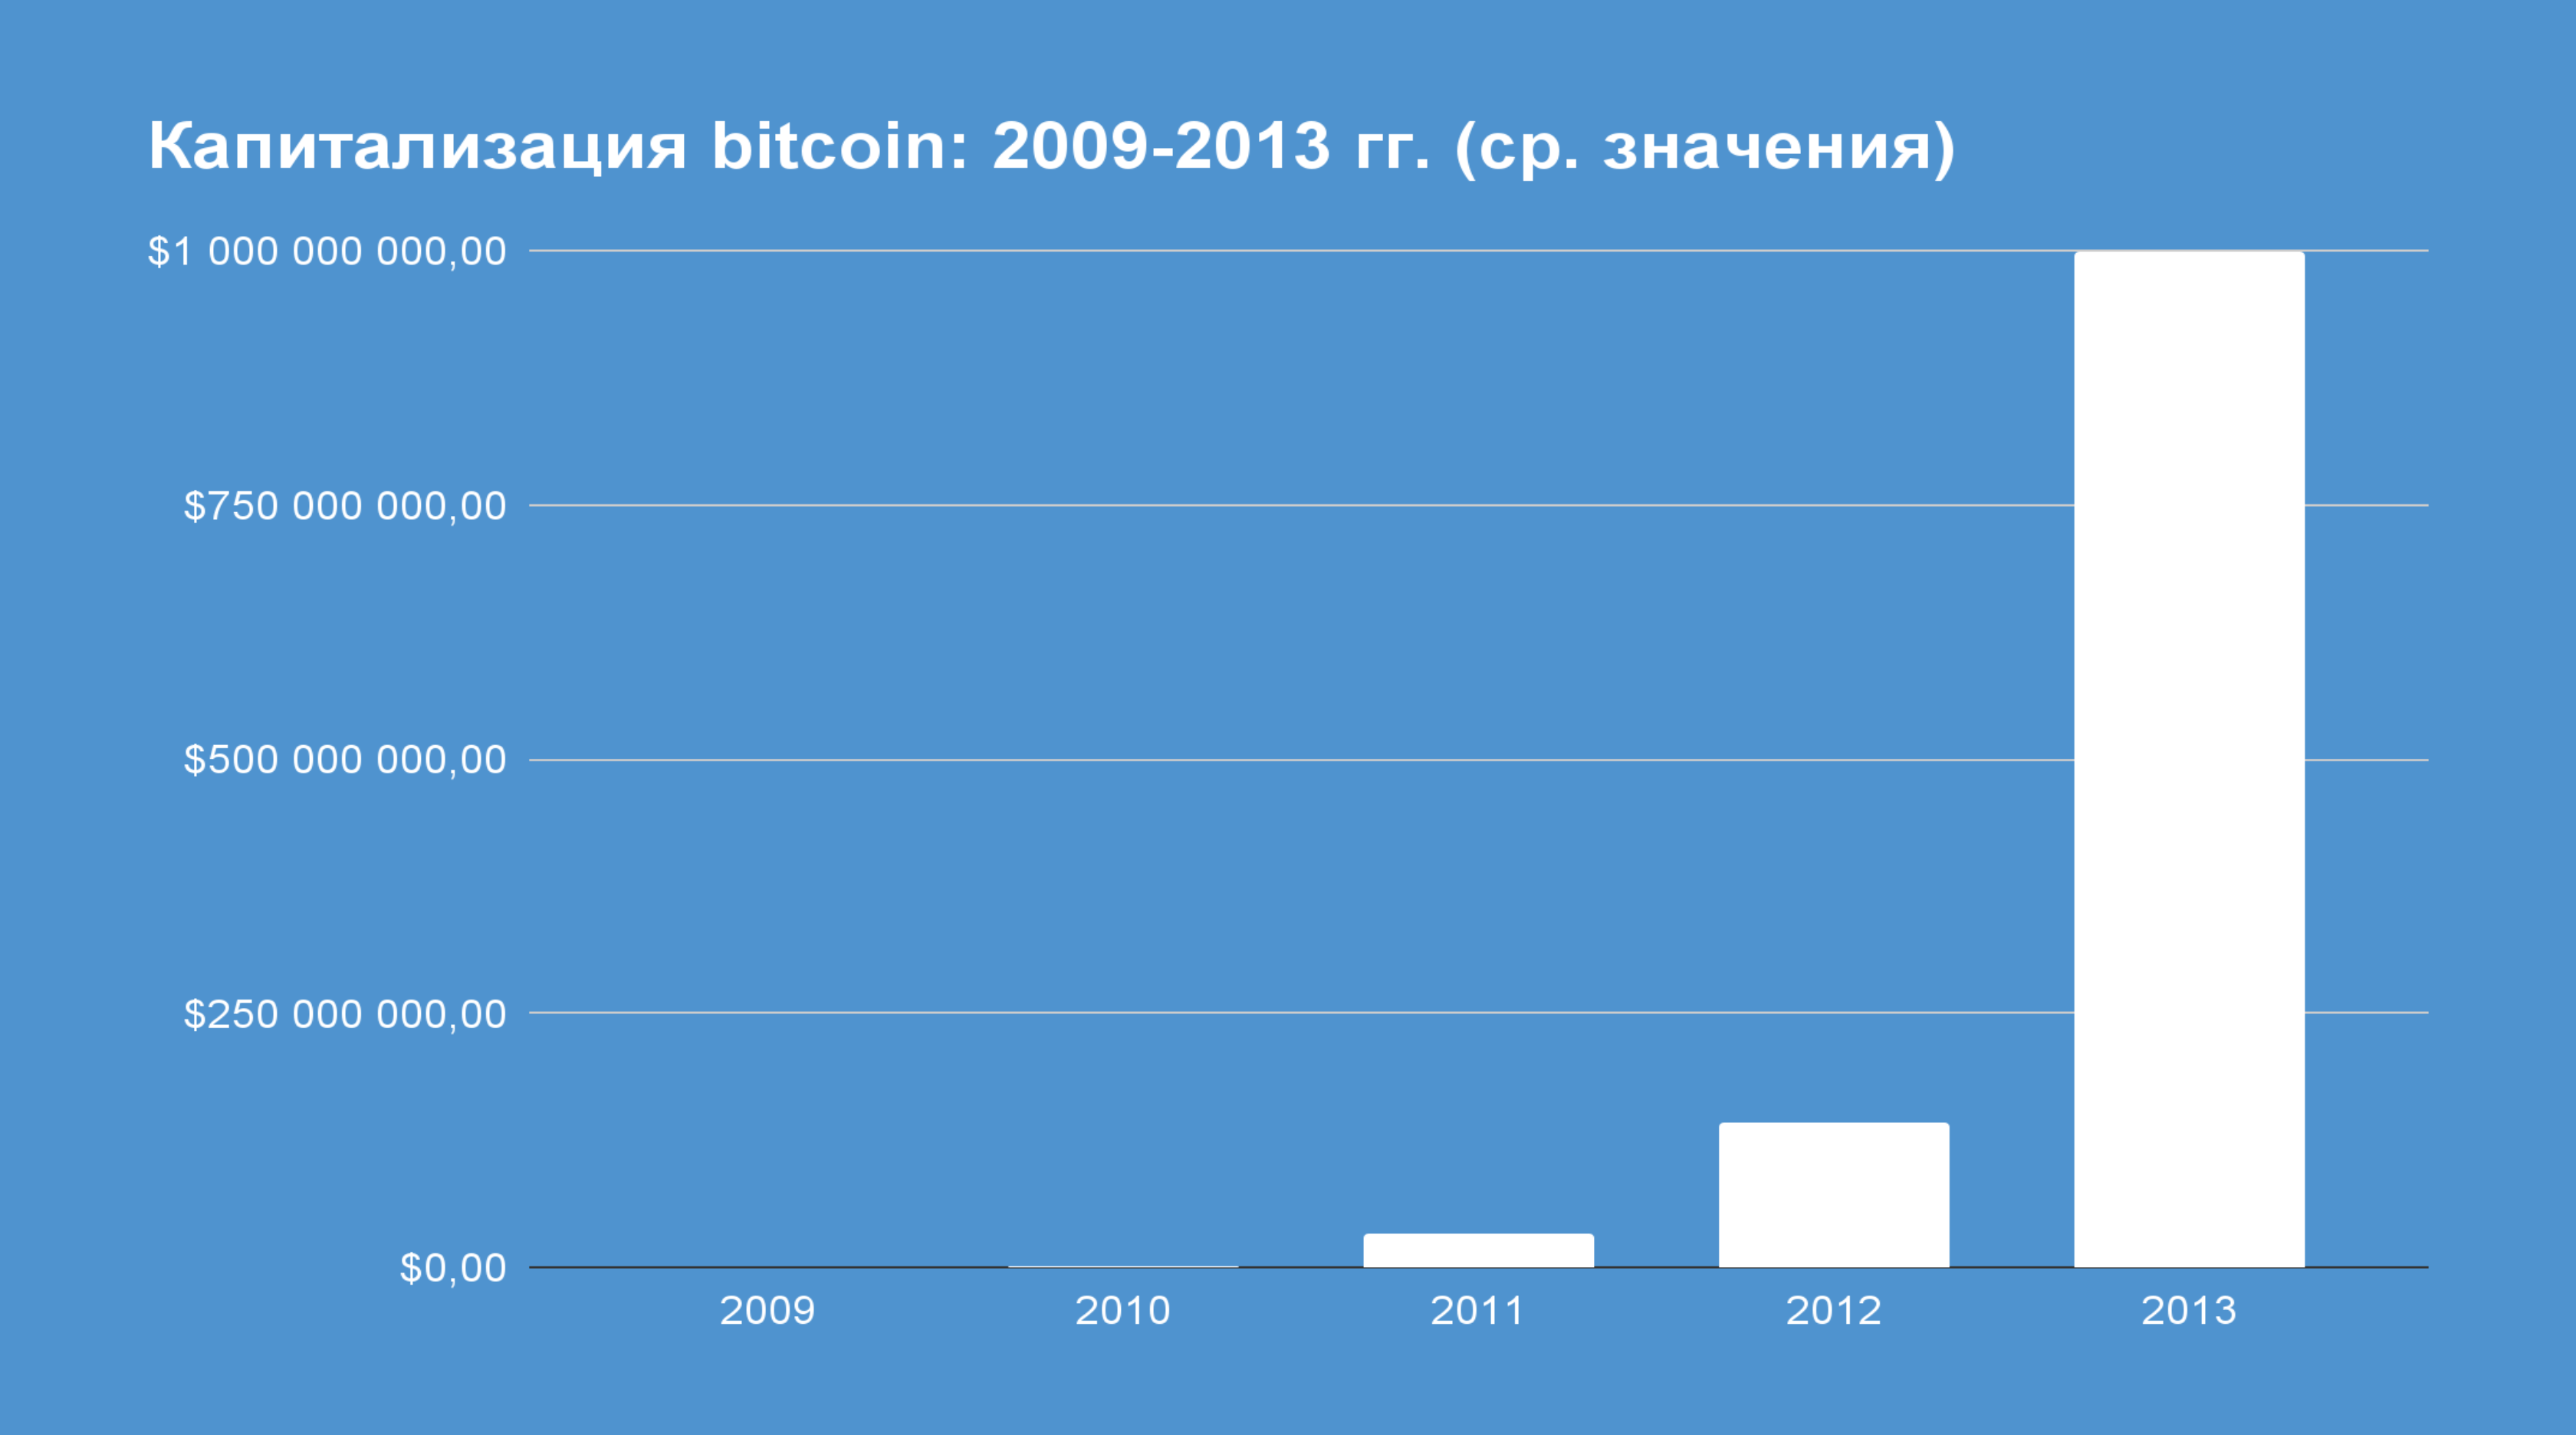 Капитализация биткоин. Менаскоп